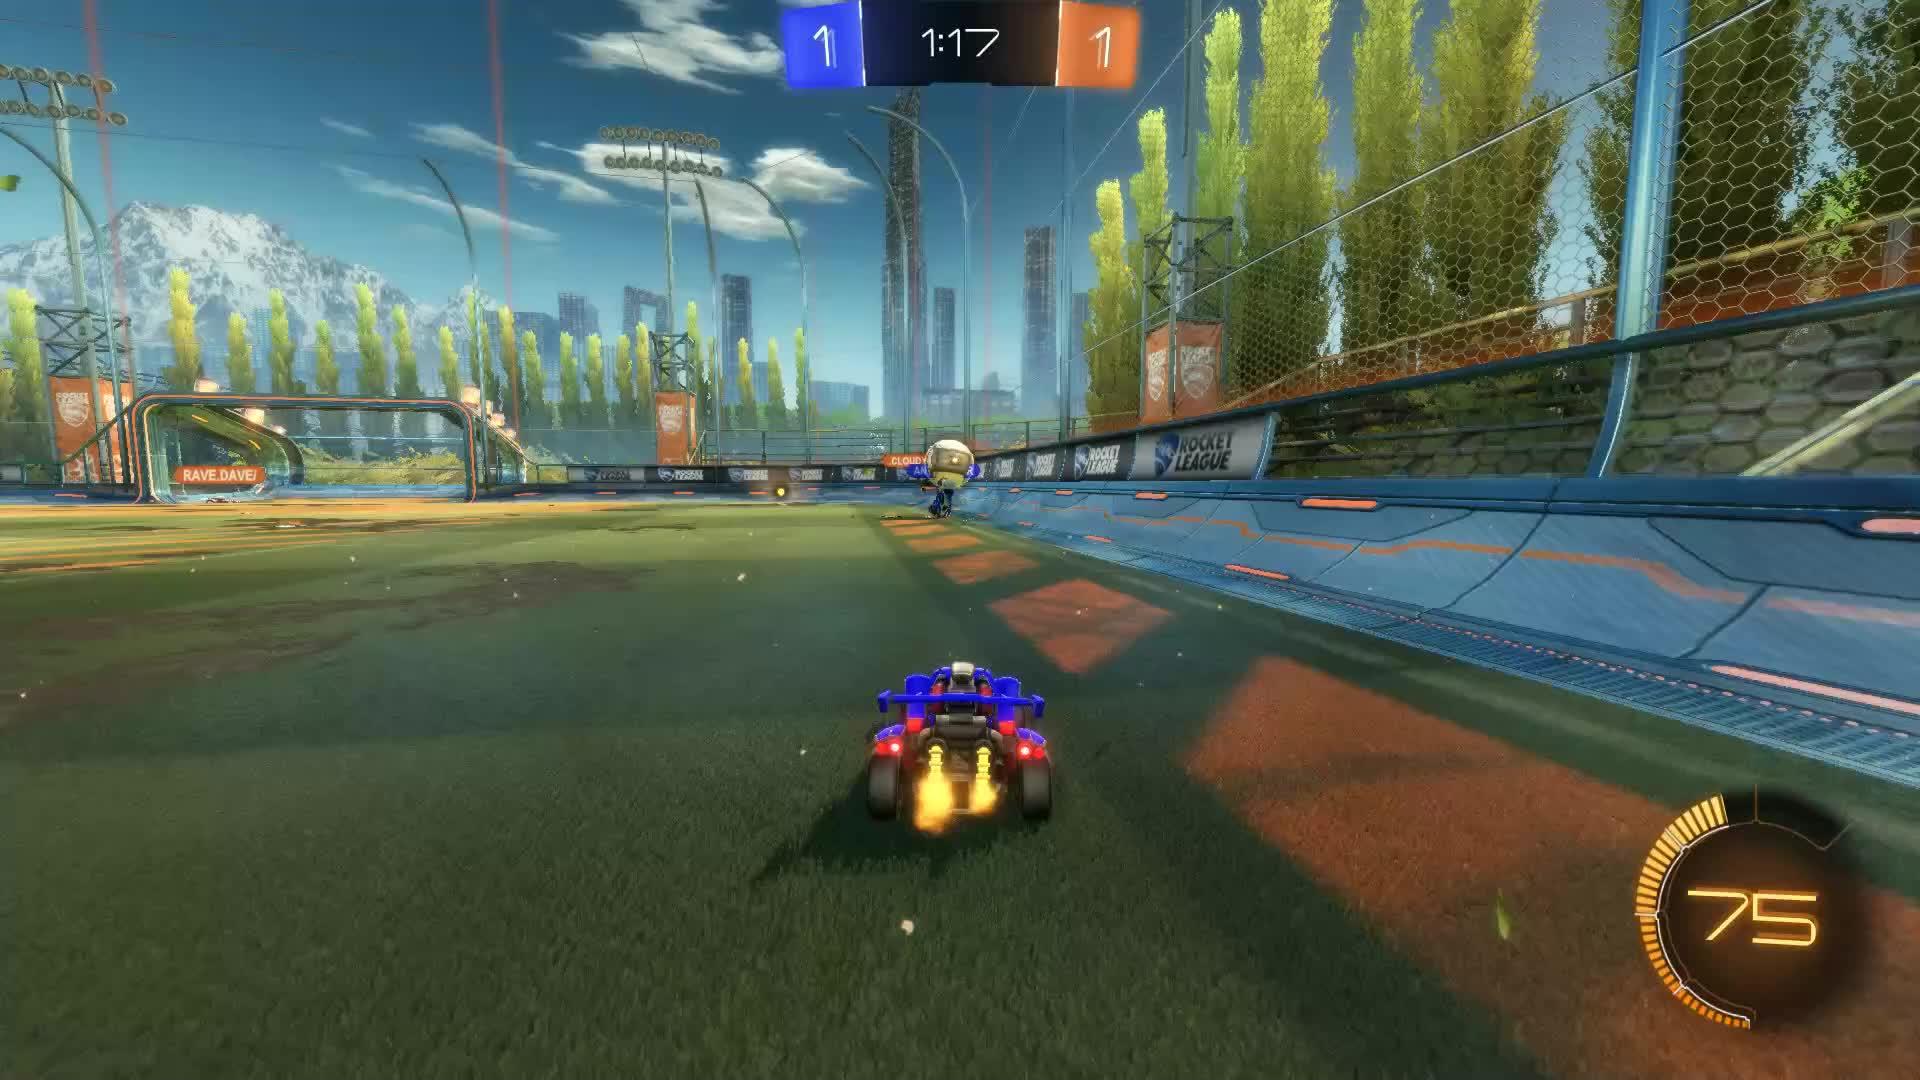 DiamondDog., Gif Your Game, GifYourGame, Goal, Rocket League, RocketLeague, Goal 3: DiamondDog. GIFs